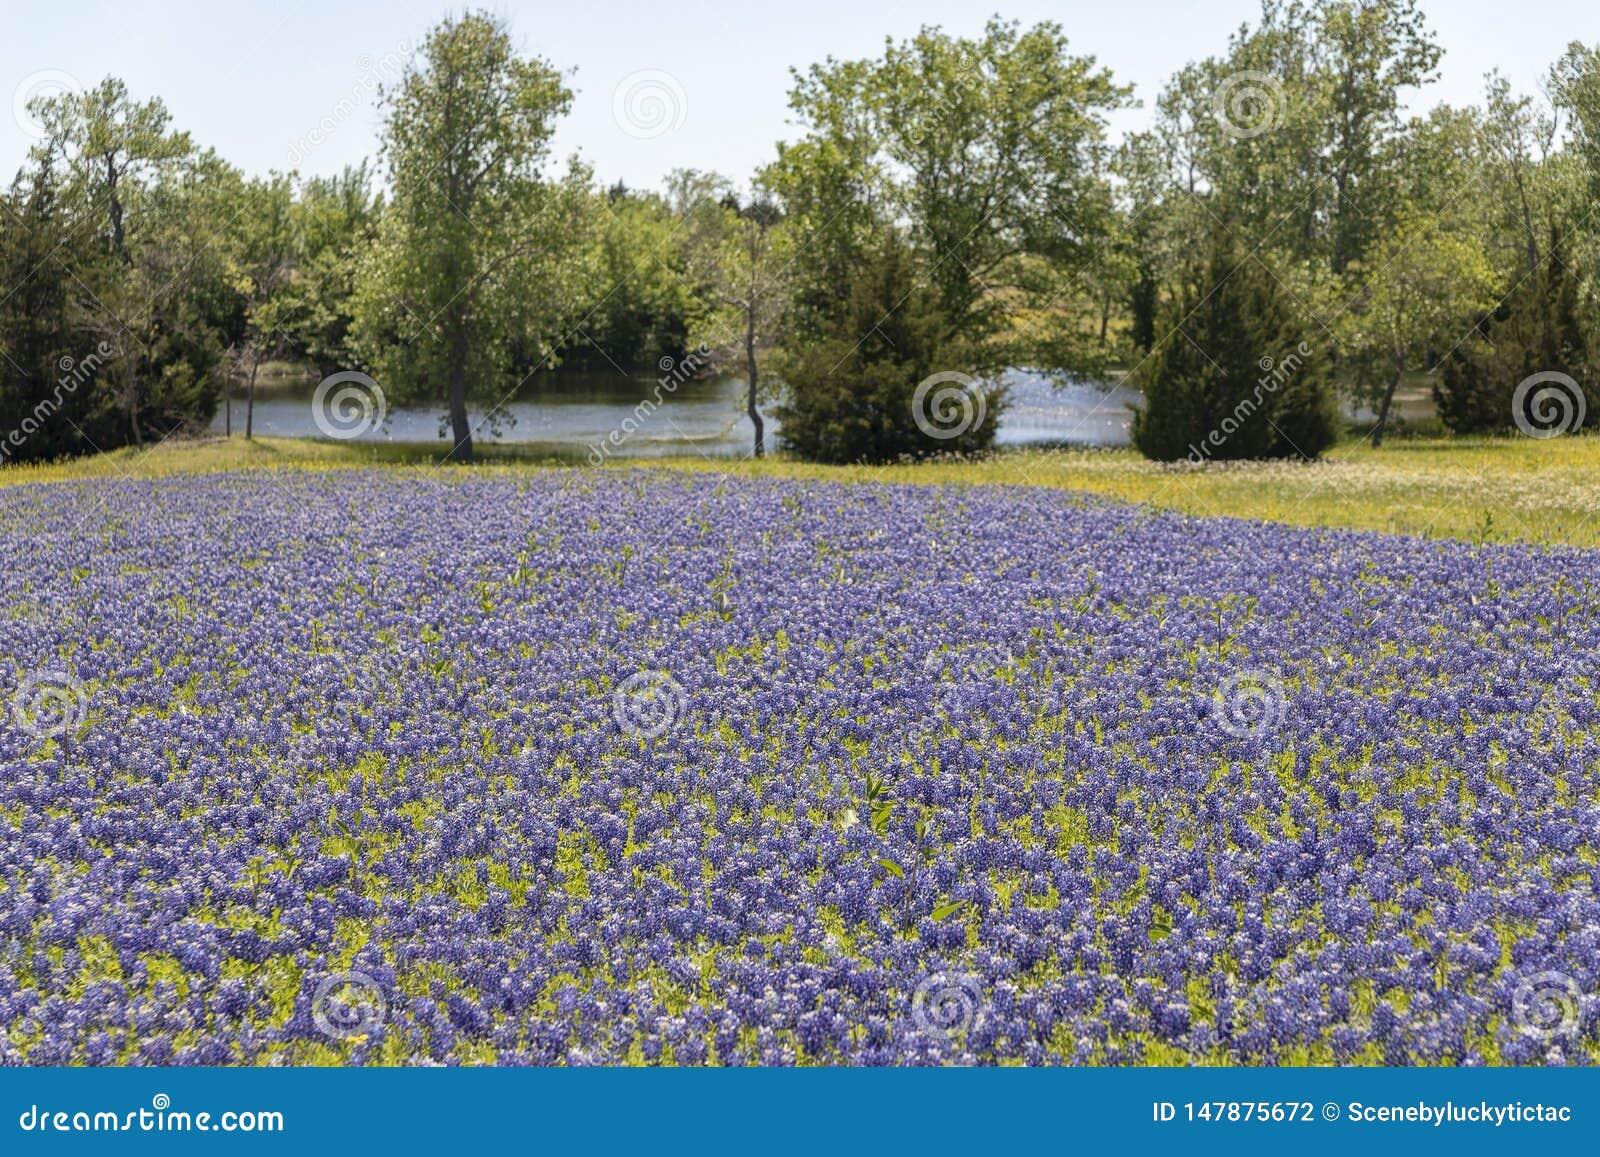 Ennis Texas Bluebonnet Field On Farm Stock Photo Image Of Summer